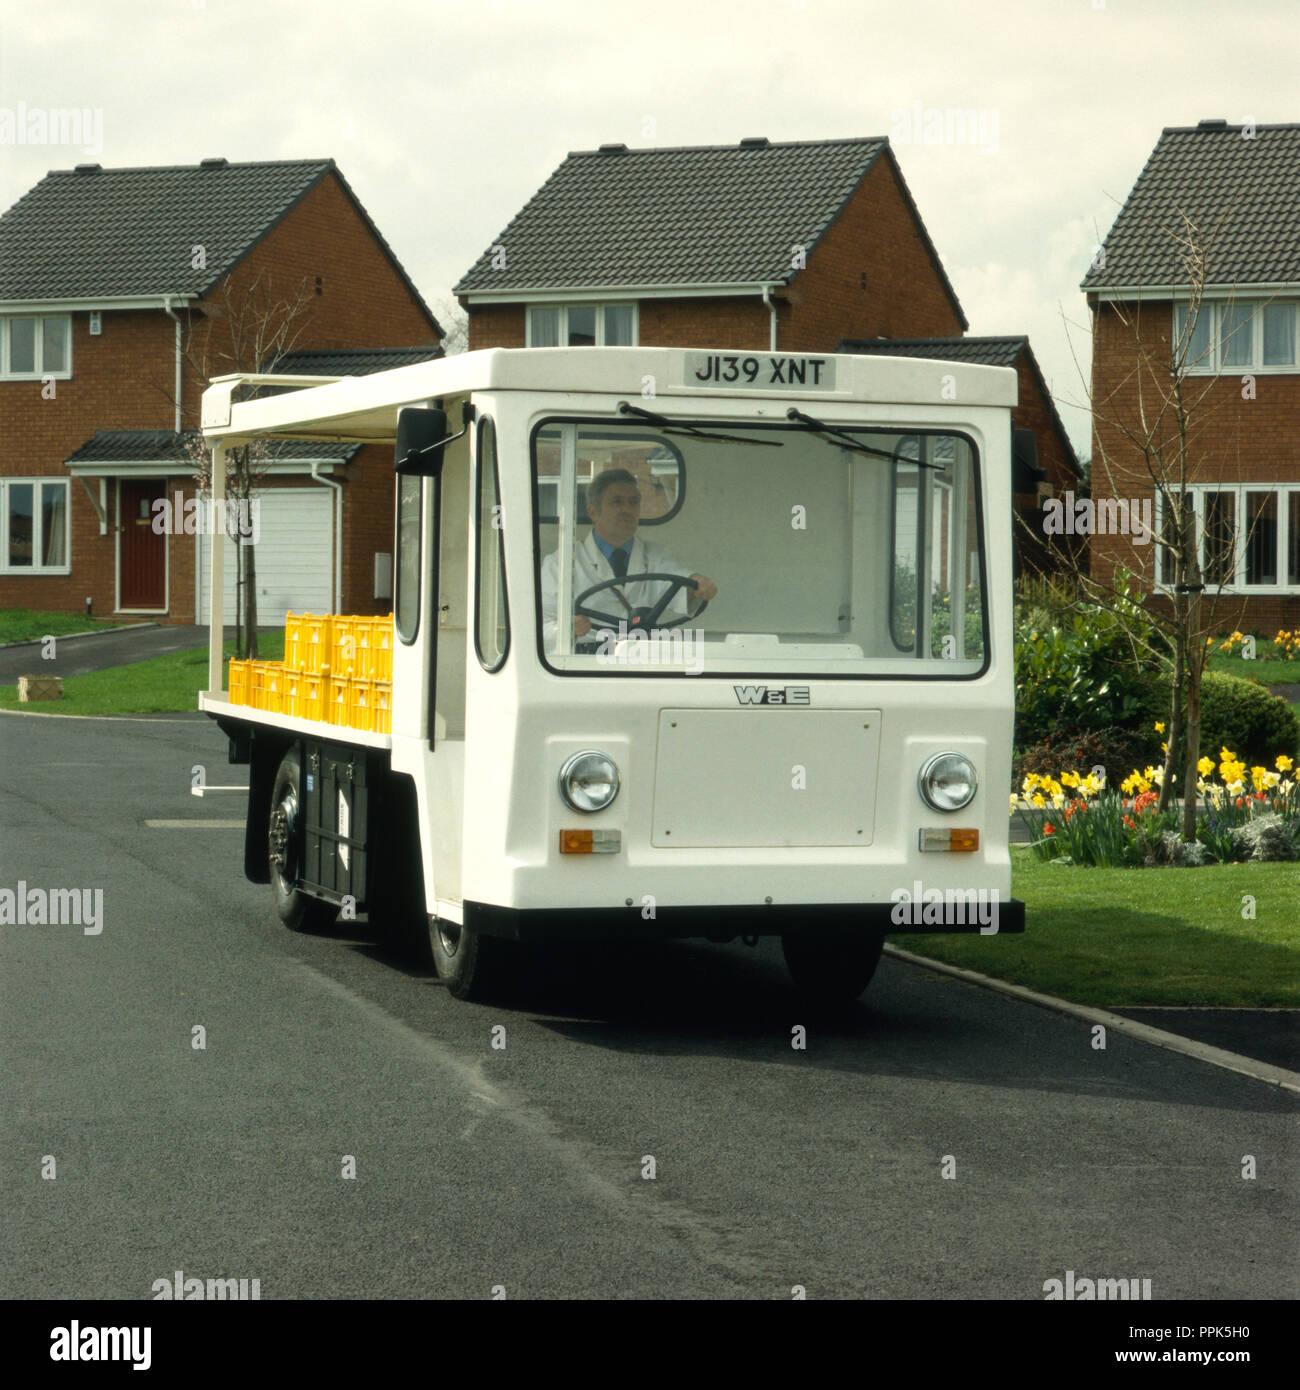 Doorstep Delivery Birmingham Al